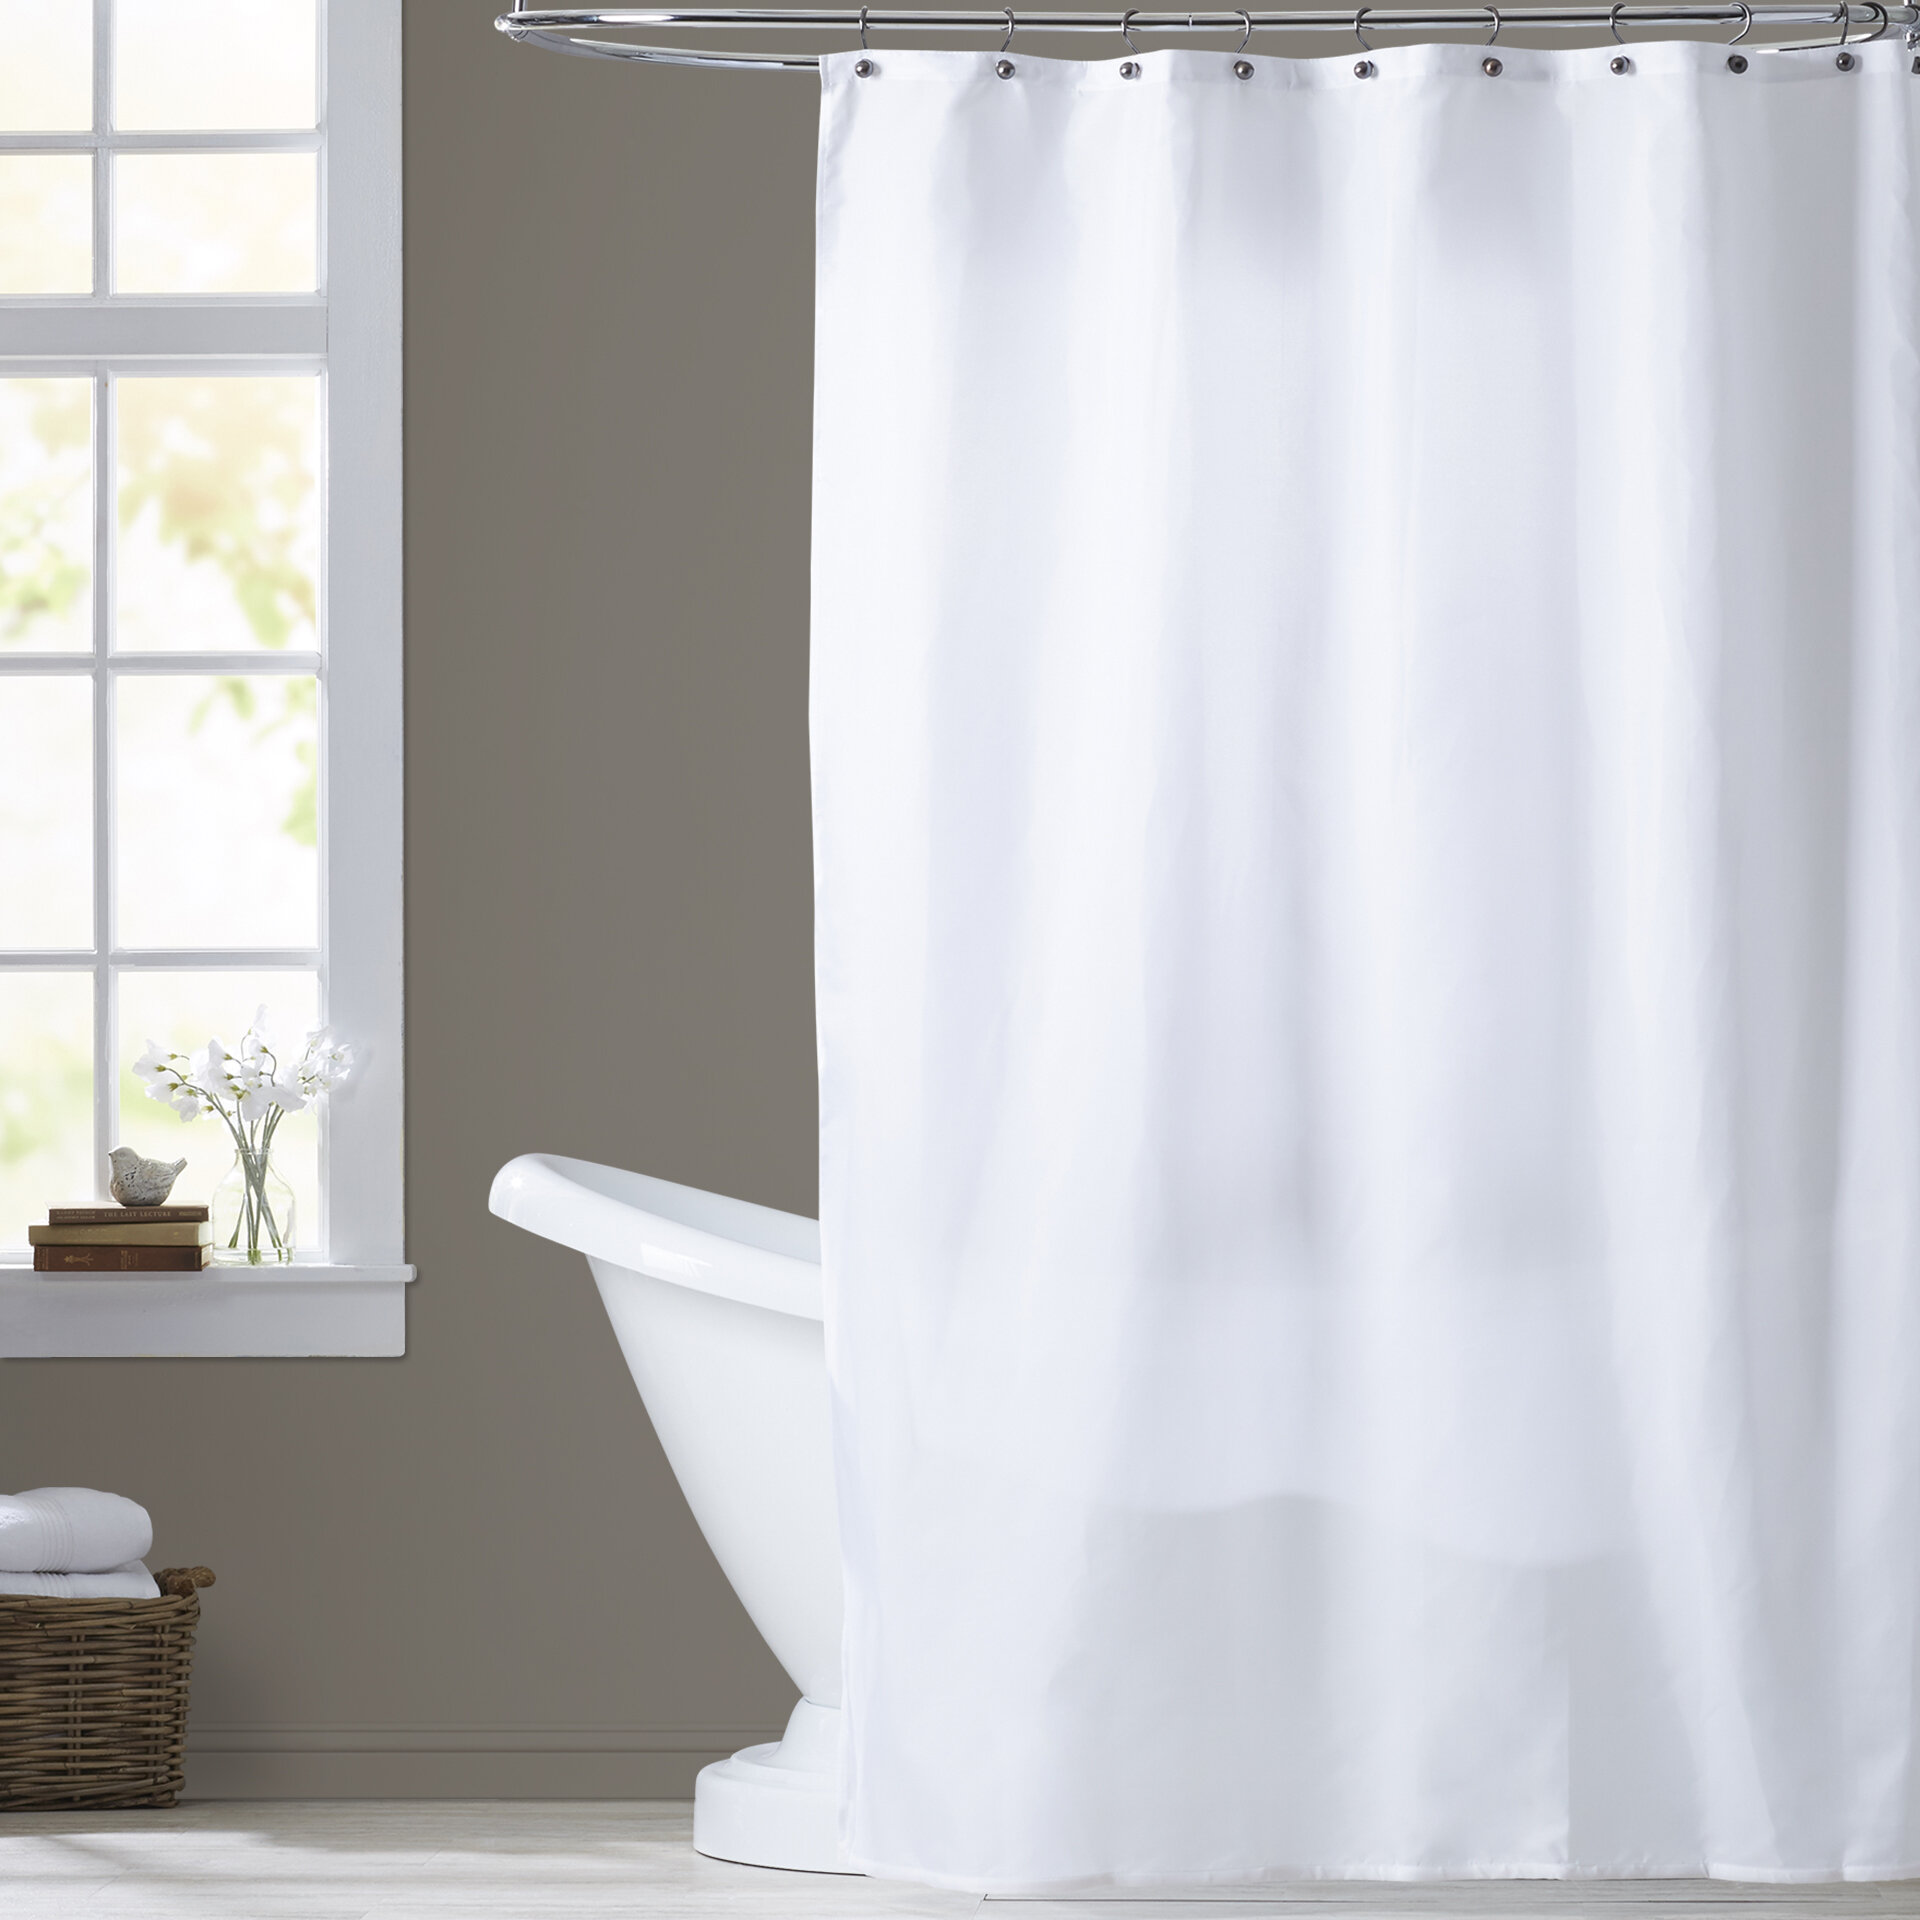 Three Posts Berning Nylon Shower Curtain Liner & Reviews   Wayfair